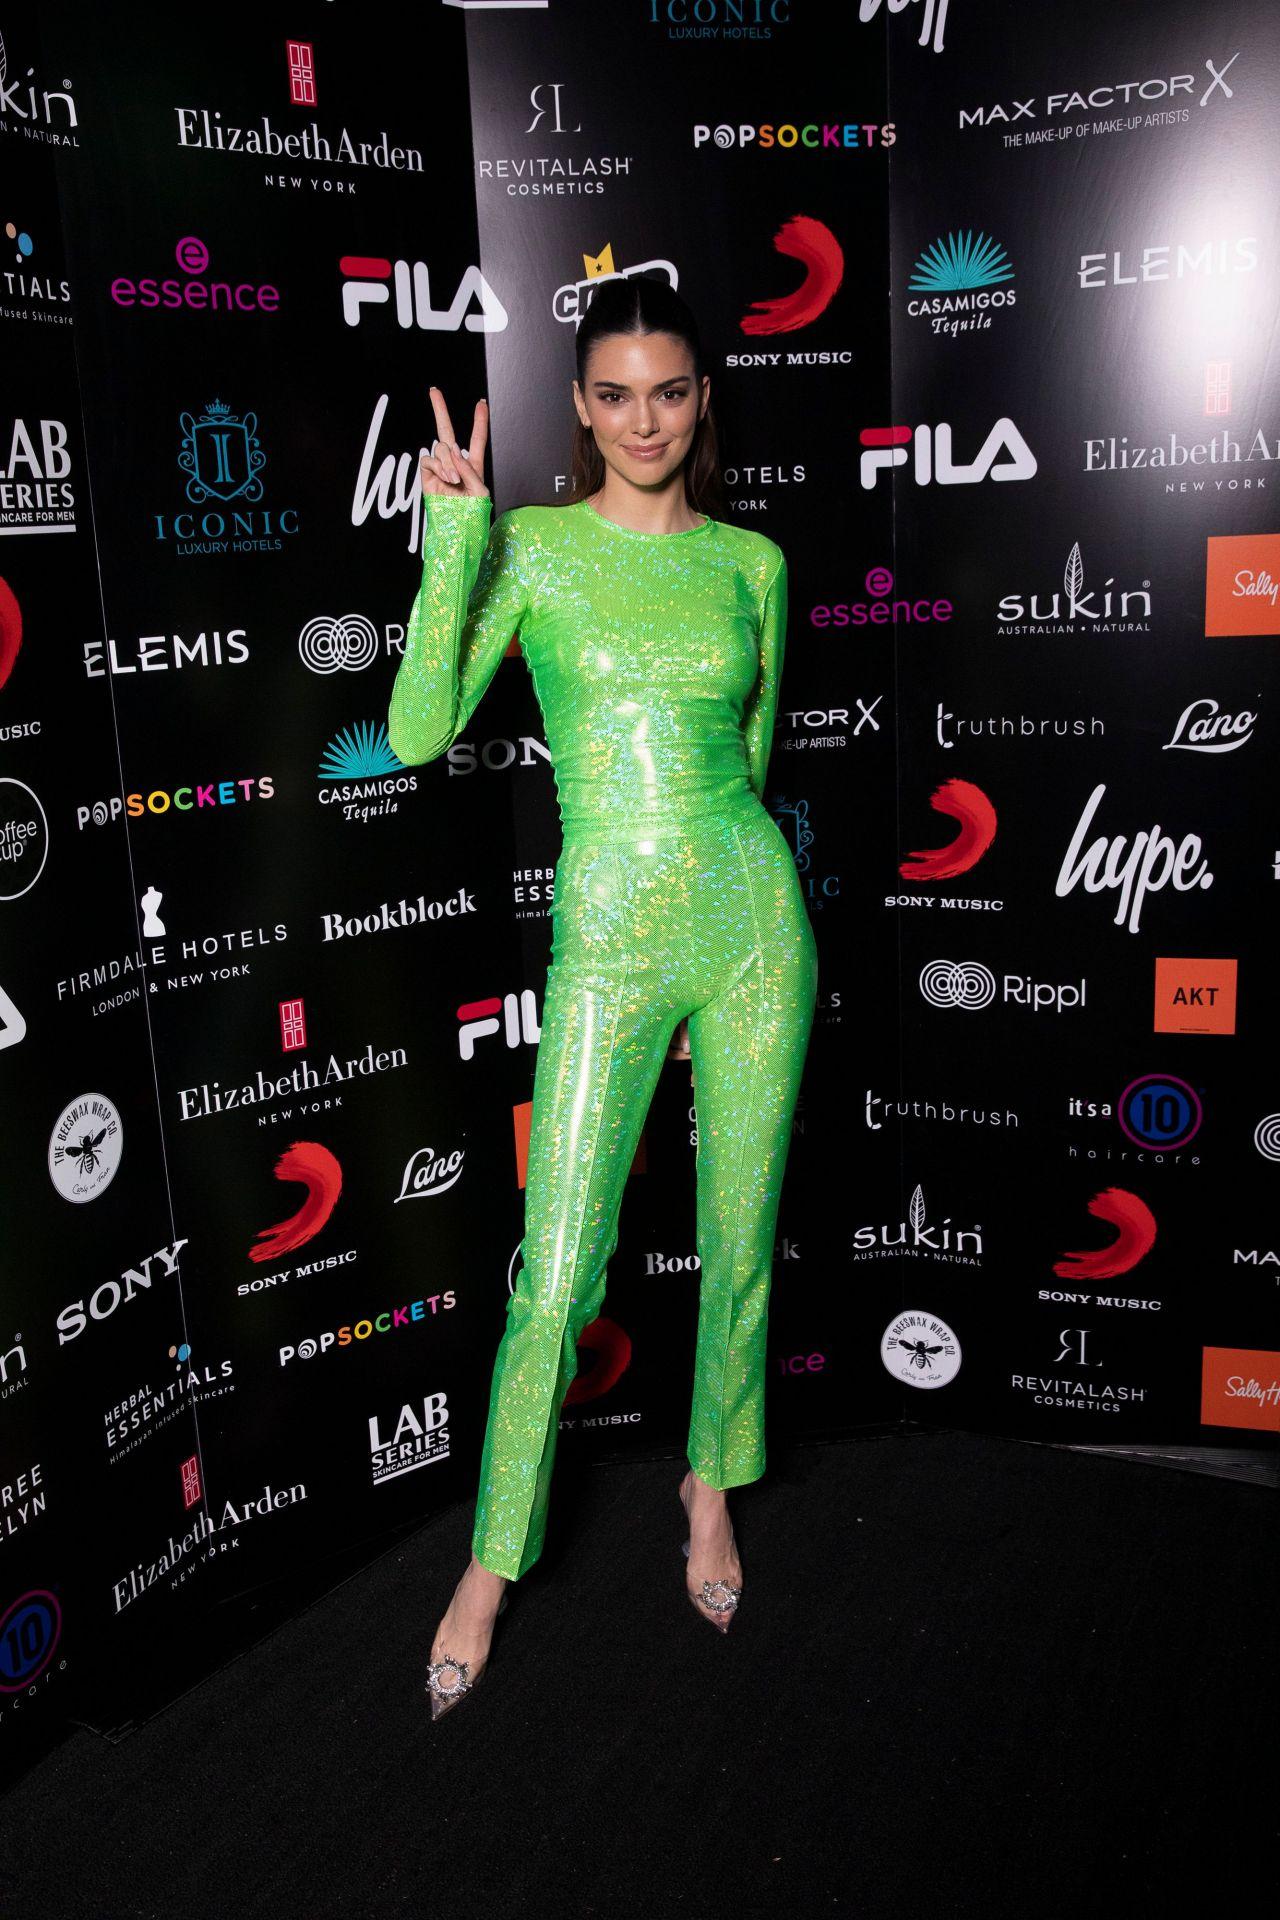 Kendall Jenner ✌️💚 #KendallJenner #BritAwards #BritAwards2020 https://t.co/TXaSMcxxcs